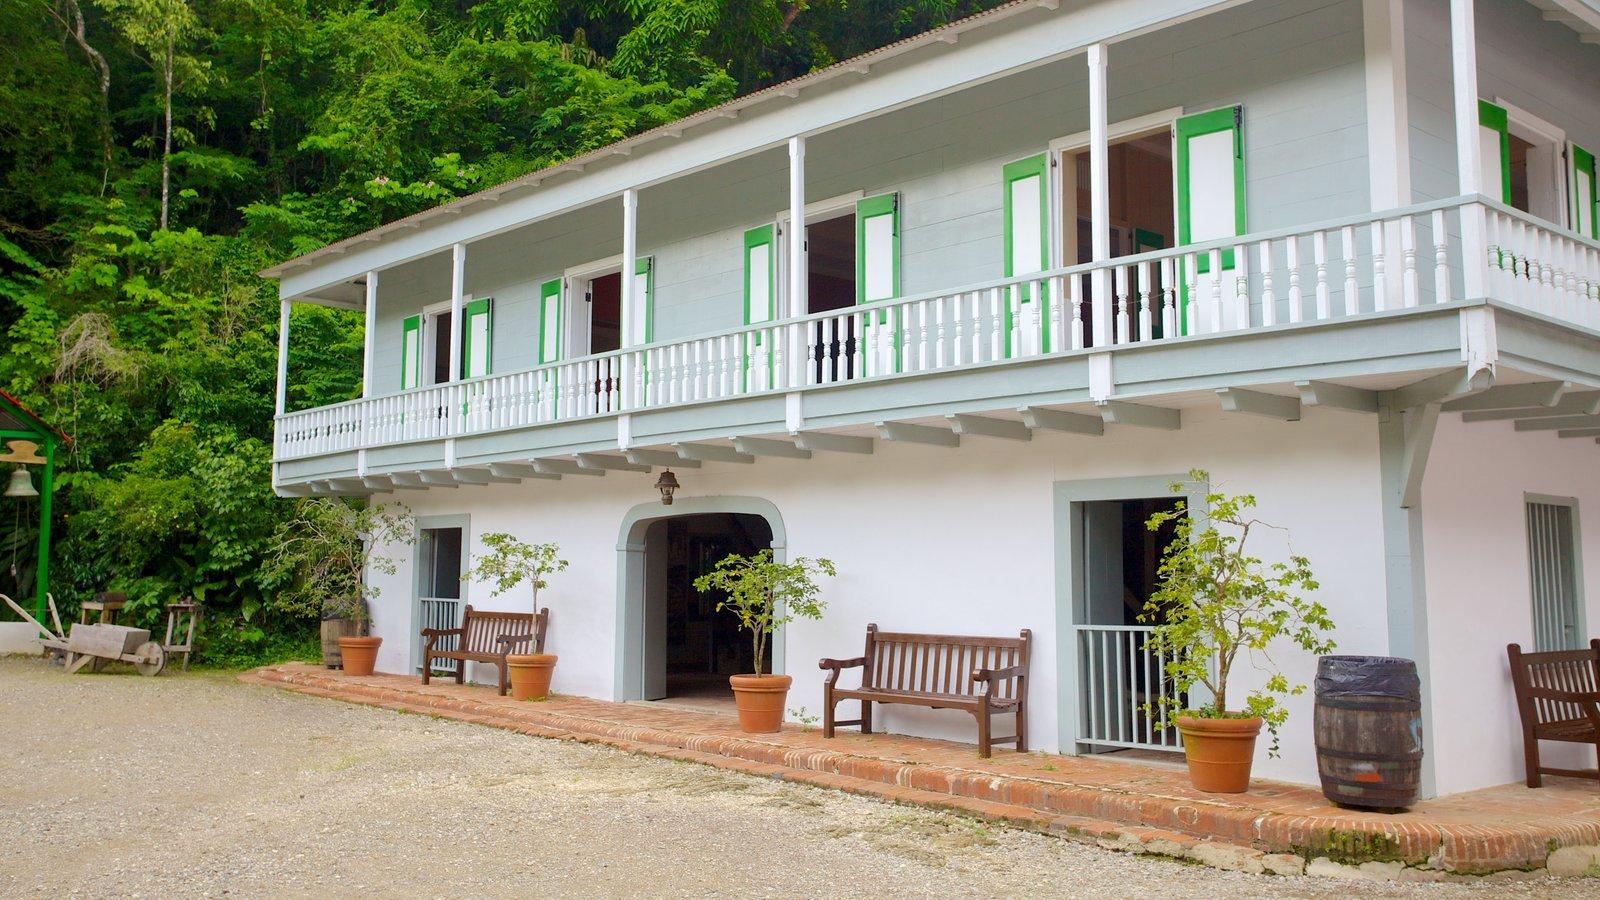 Hacienda Buena Vista which includes a house